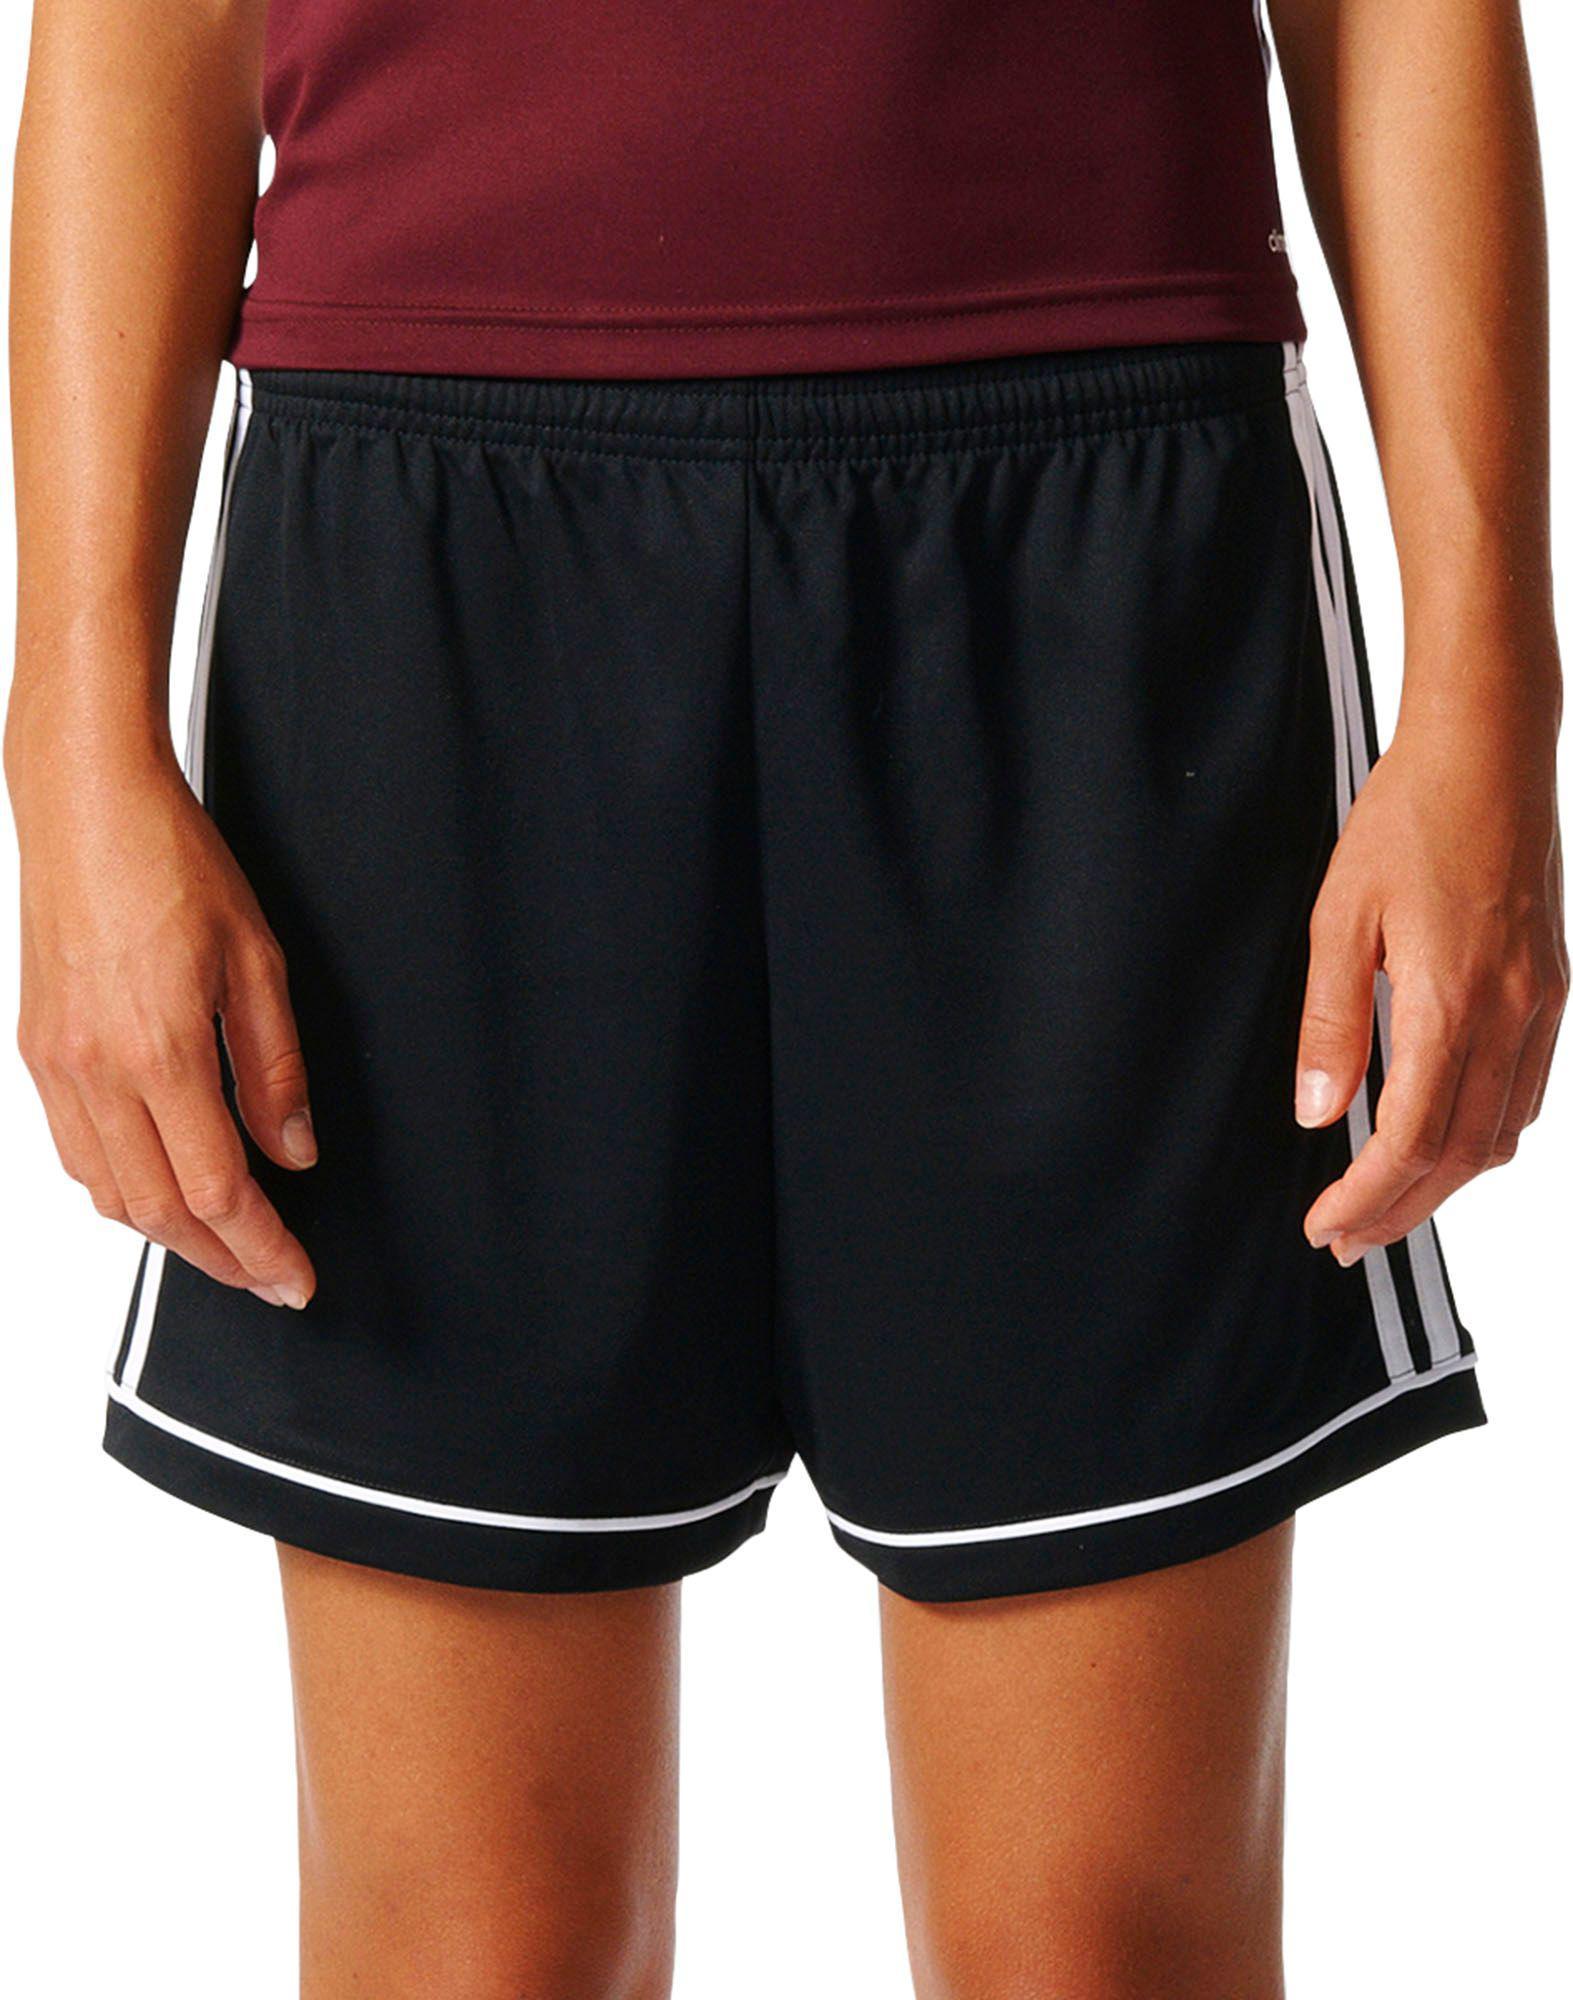 6c695ffdfad3 Lyst - Adidas Squadra 17 Soccer Shorts in Black for Men